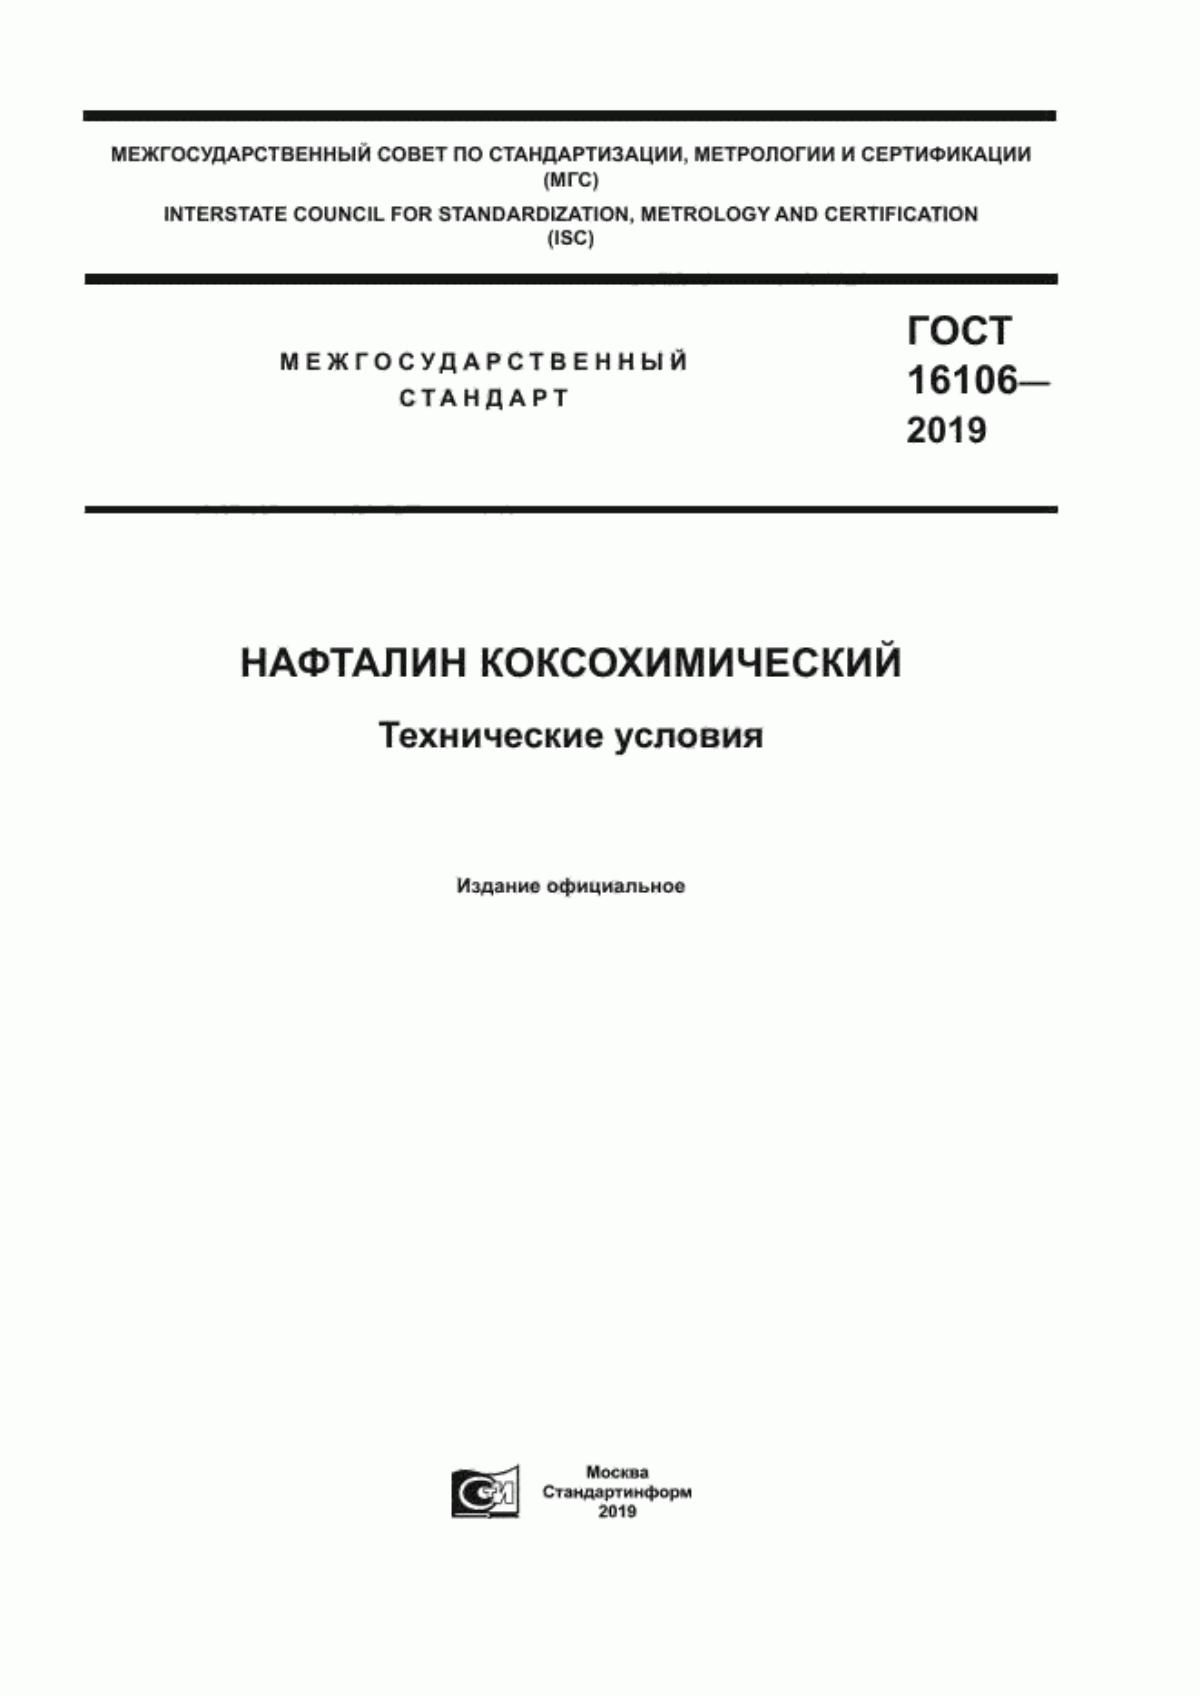 Нафталин • ru.knowledgr.com